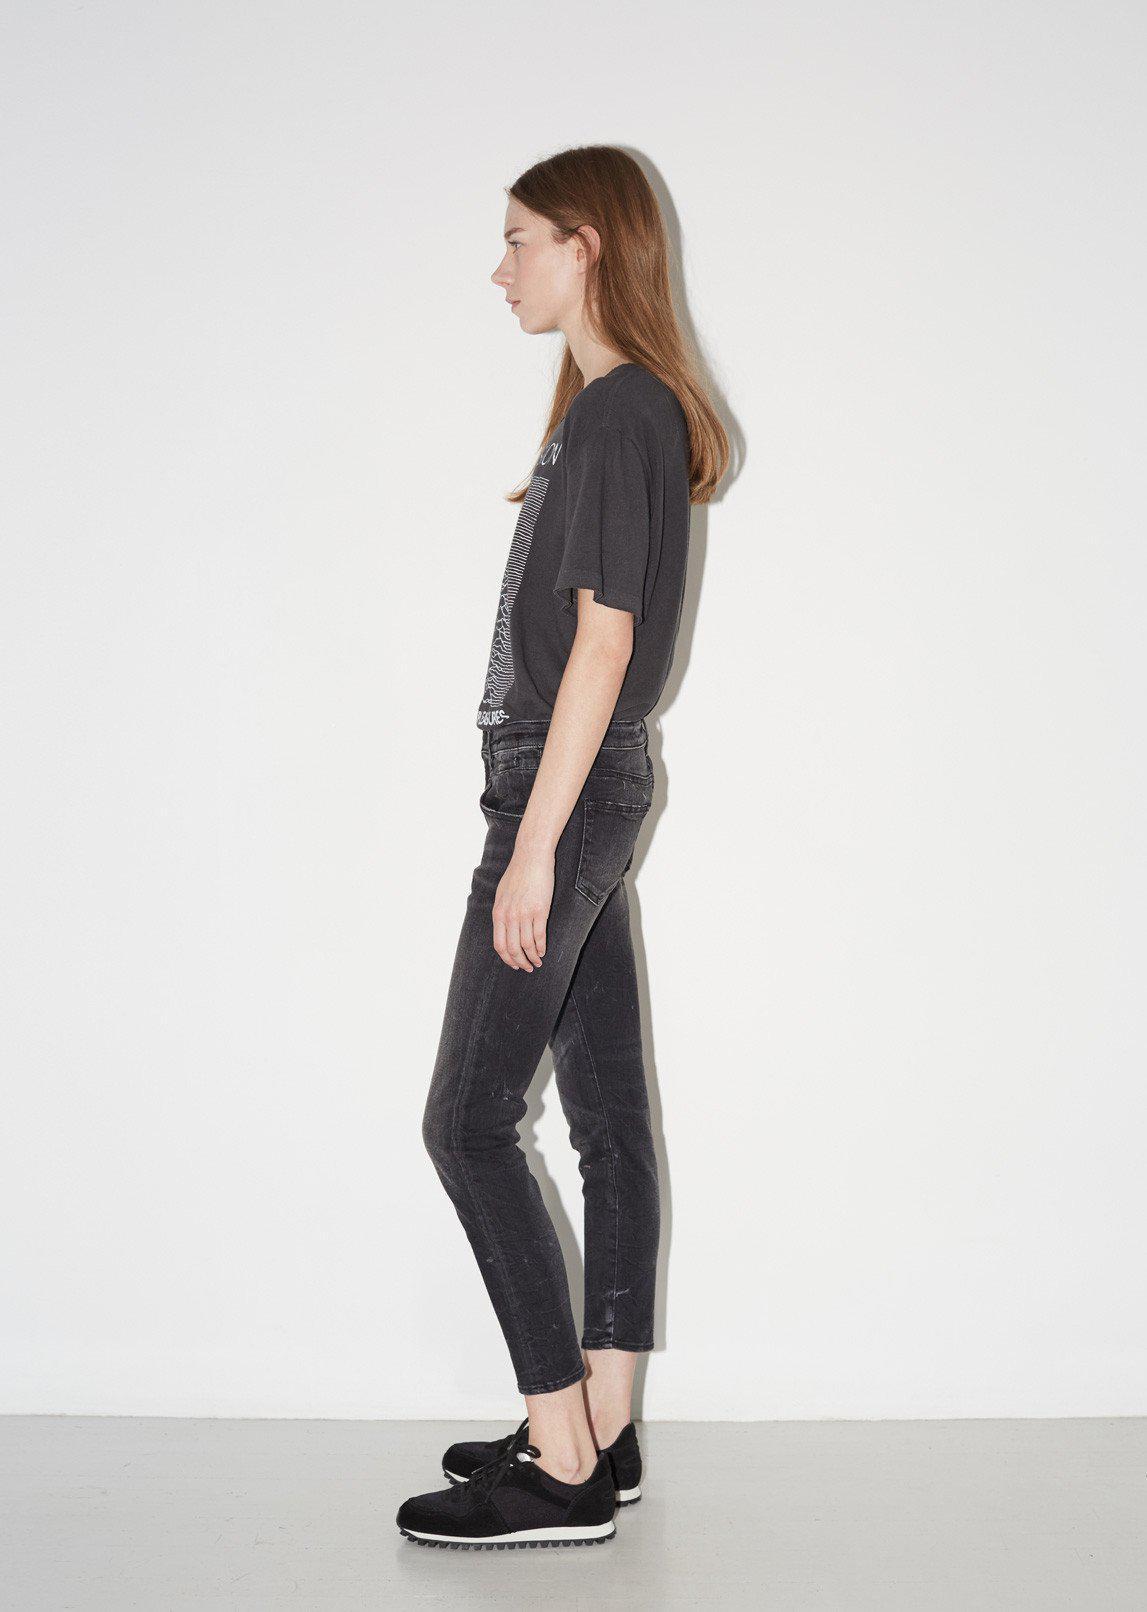 R13 Denim Boy Skinny Jeans in Black Marble (Black)